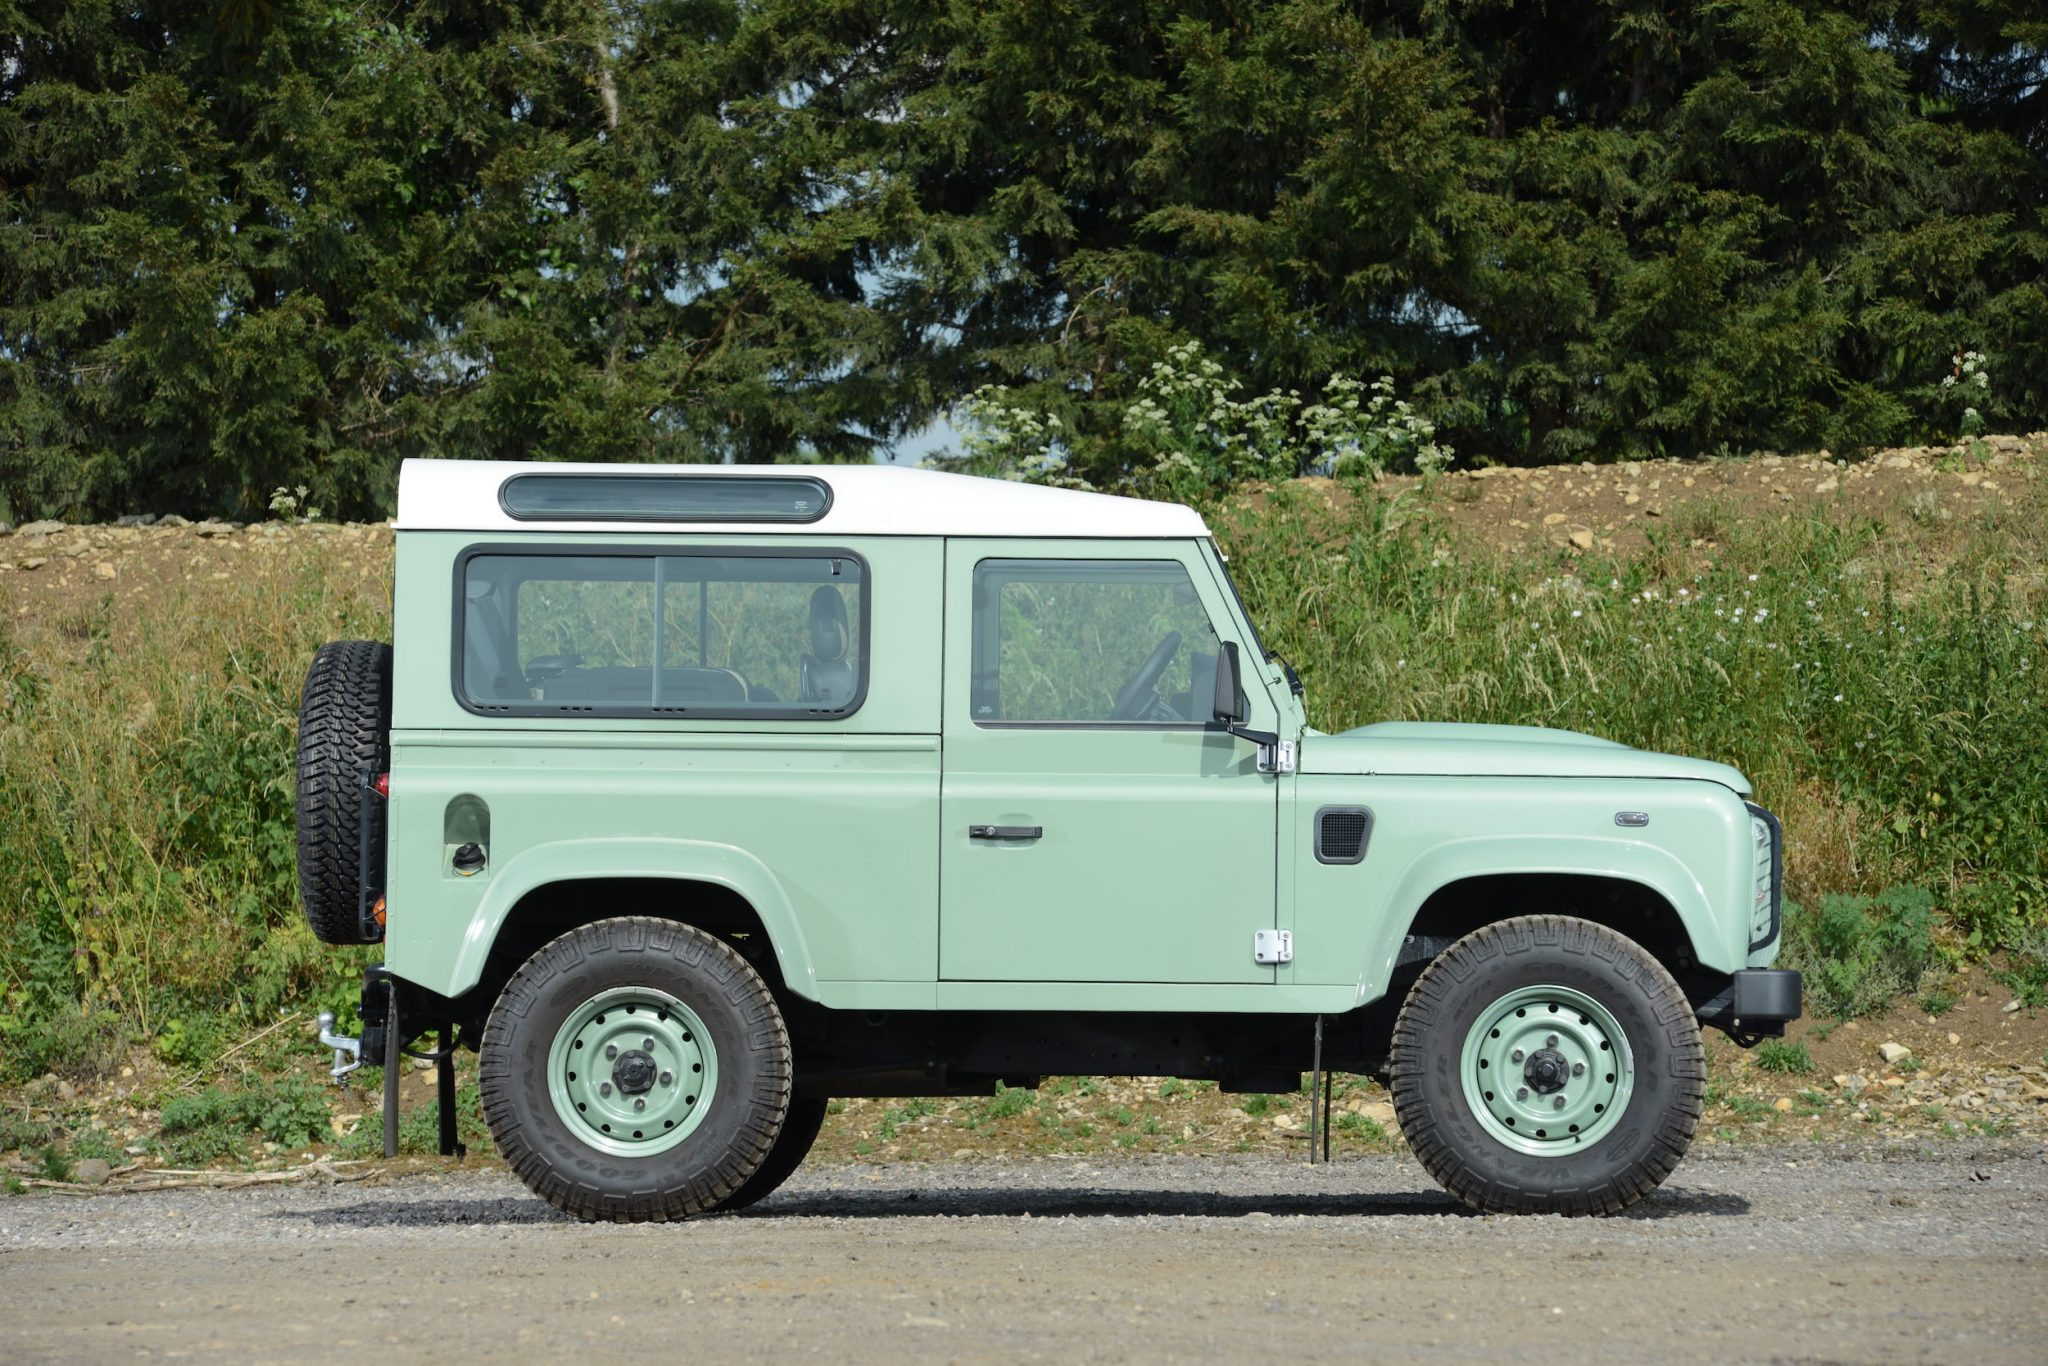 Rowan Atkinson's Land Rover Defender 14 - Rowan Atkinson's Land Rover Defender